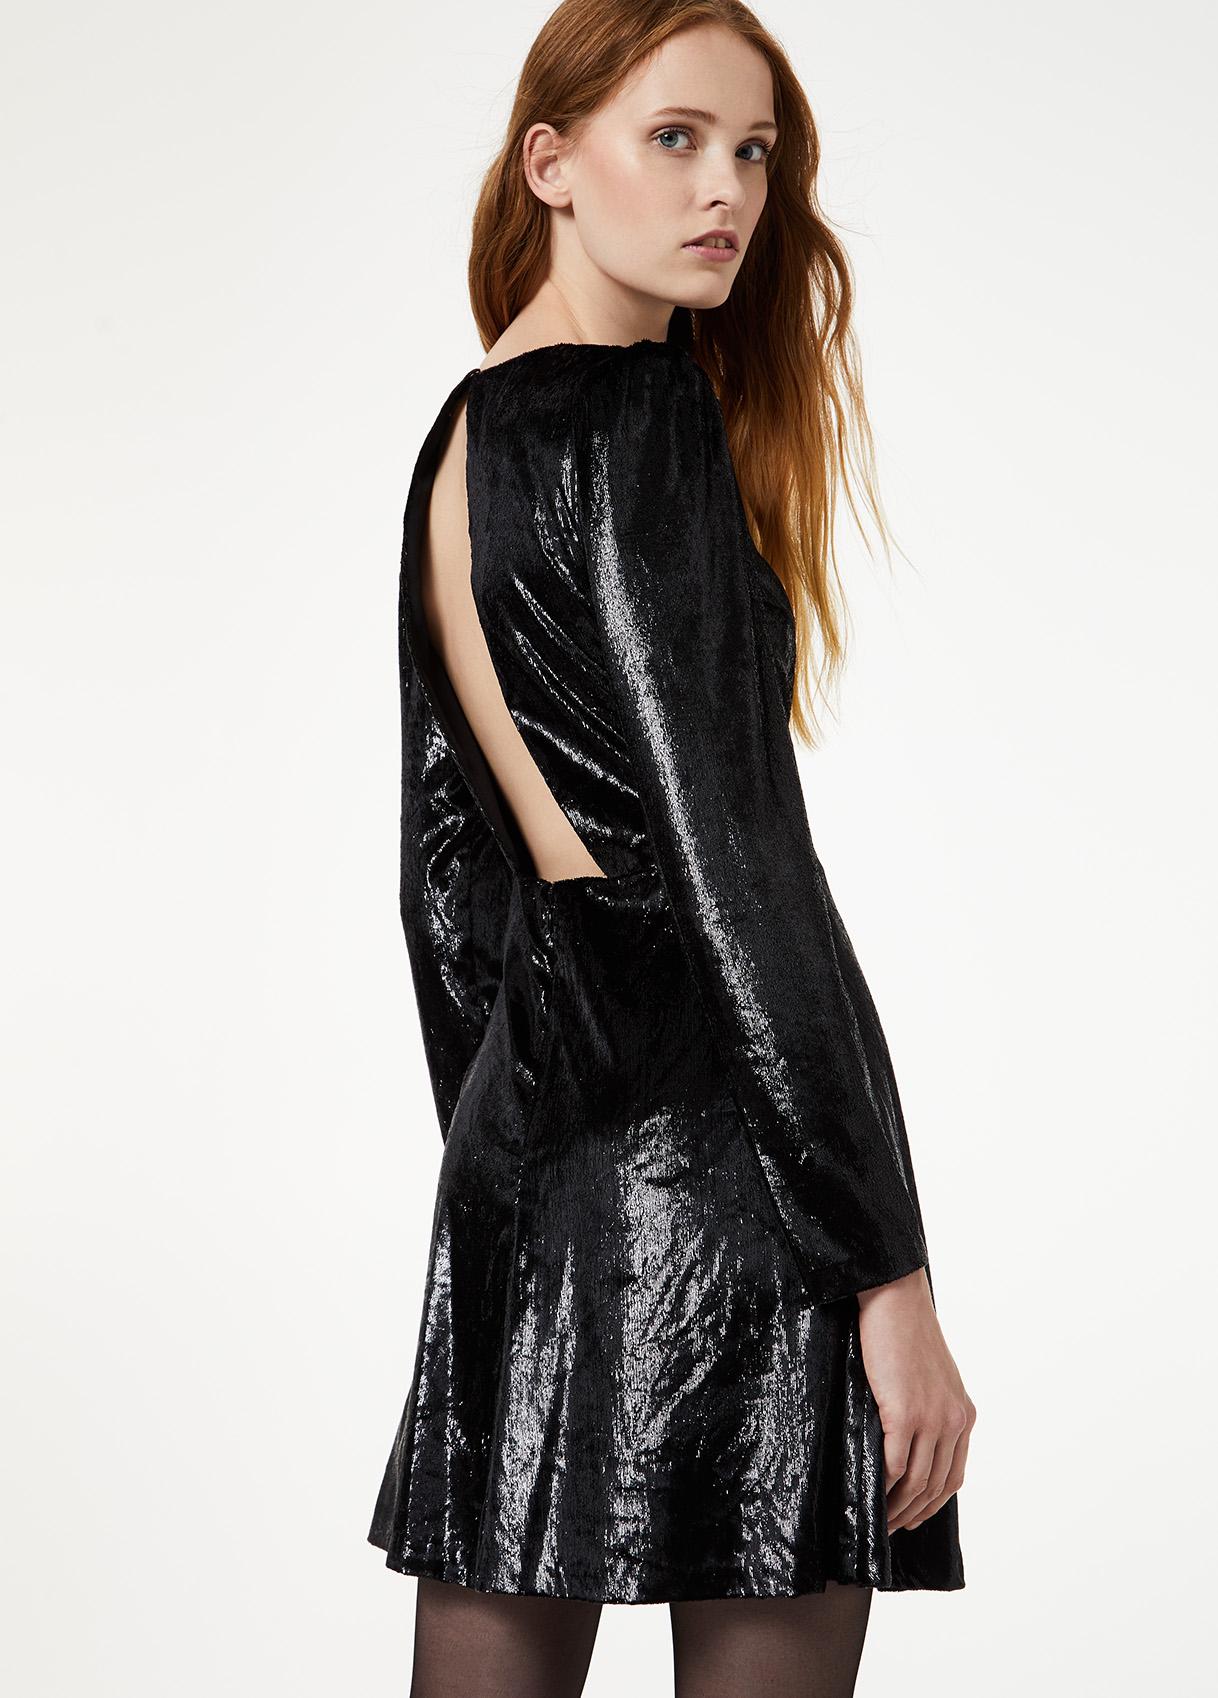 LJ_Dresses-Shortdresses